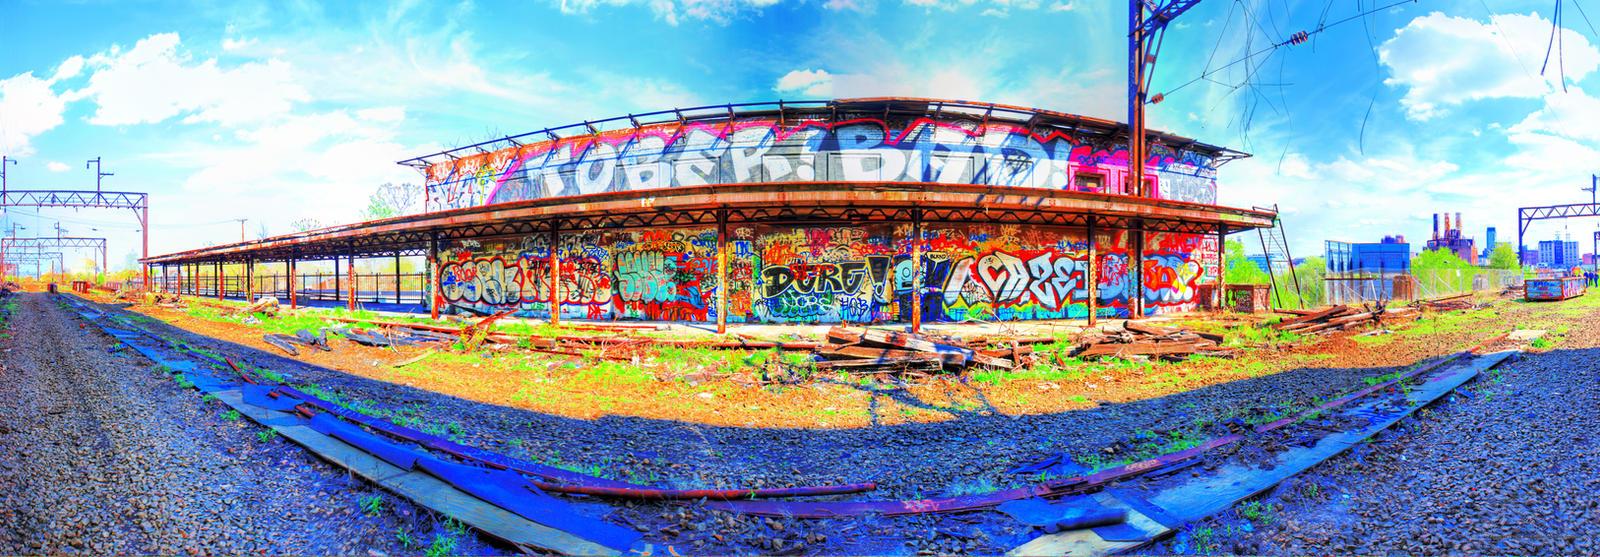 Panorama 2257 blended fused pregamma 1 fattal alph by bruhinb